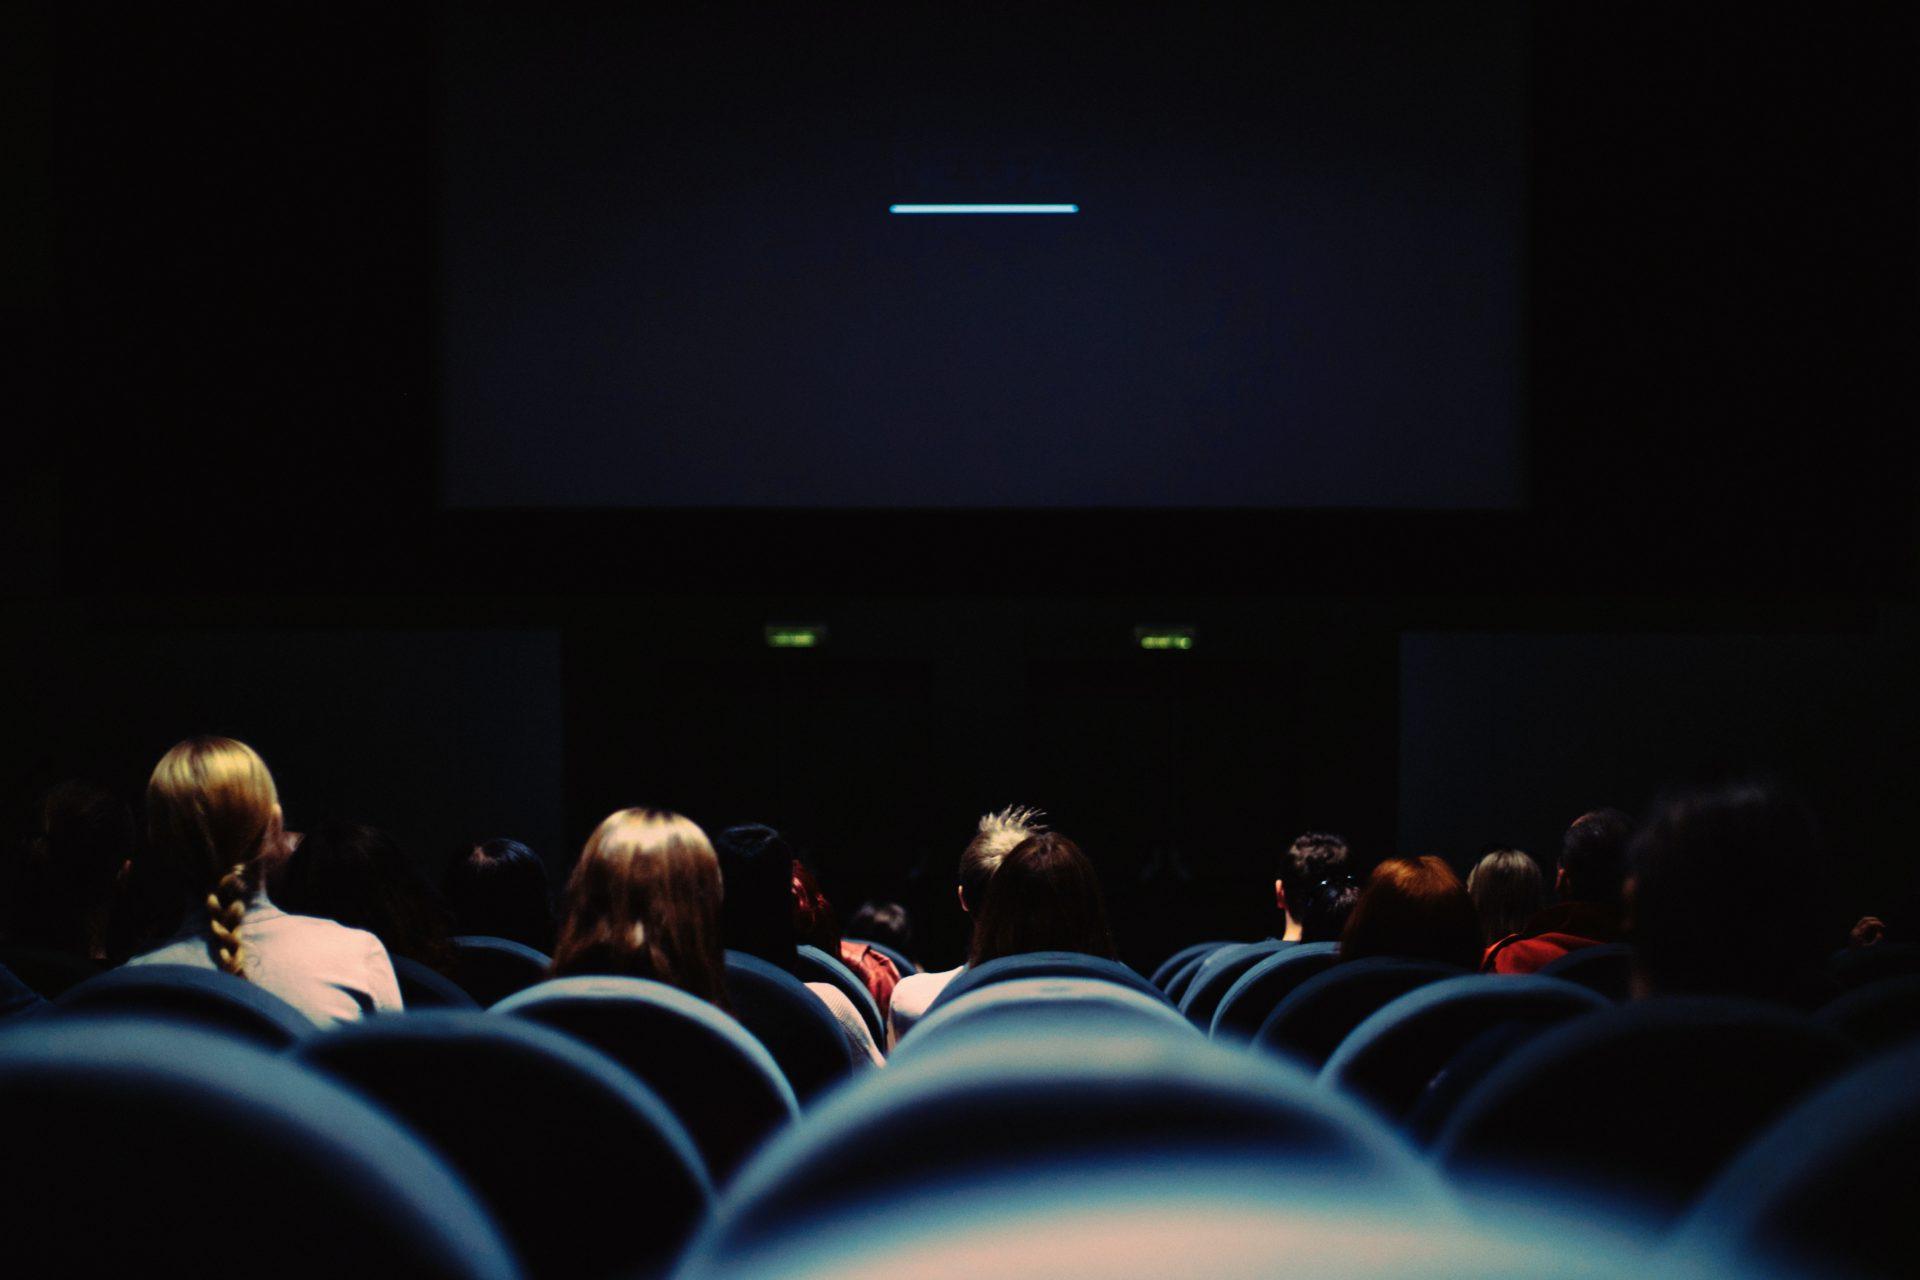 Regal Cinemas Popcorn and Food Prices